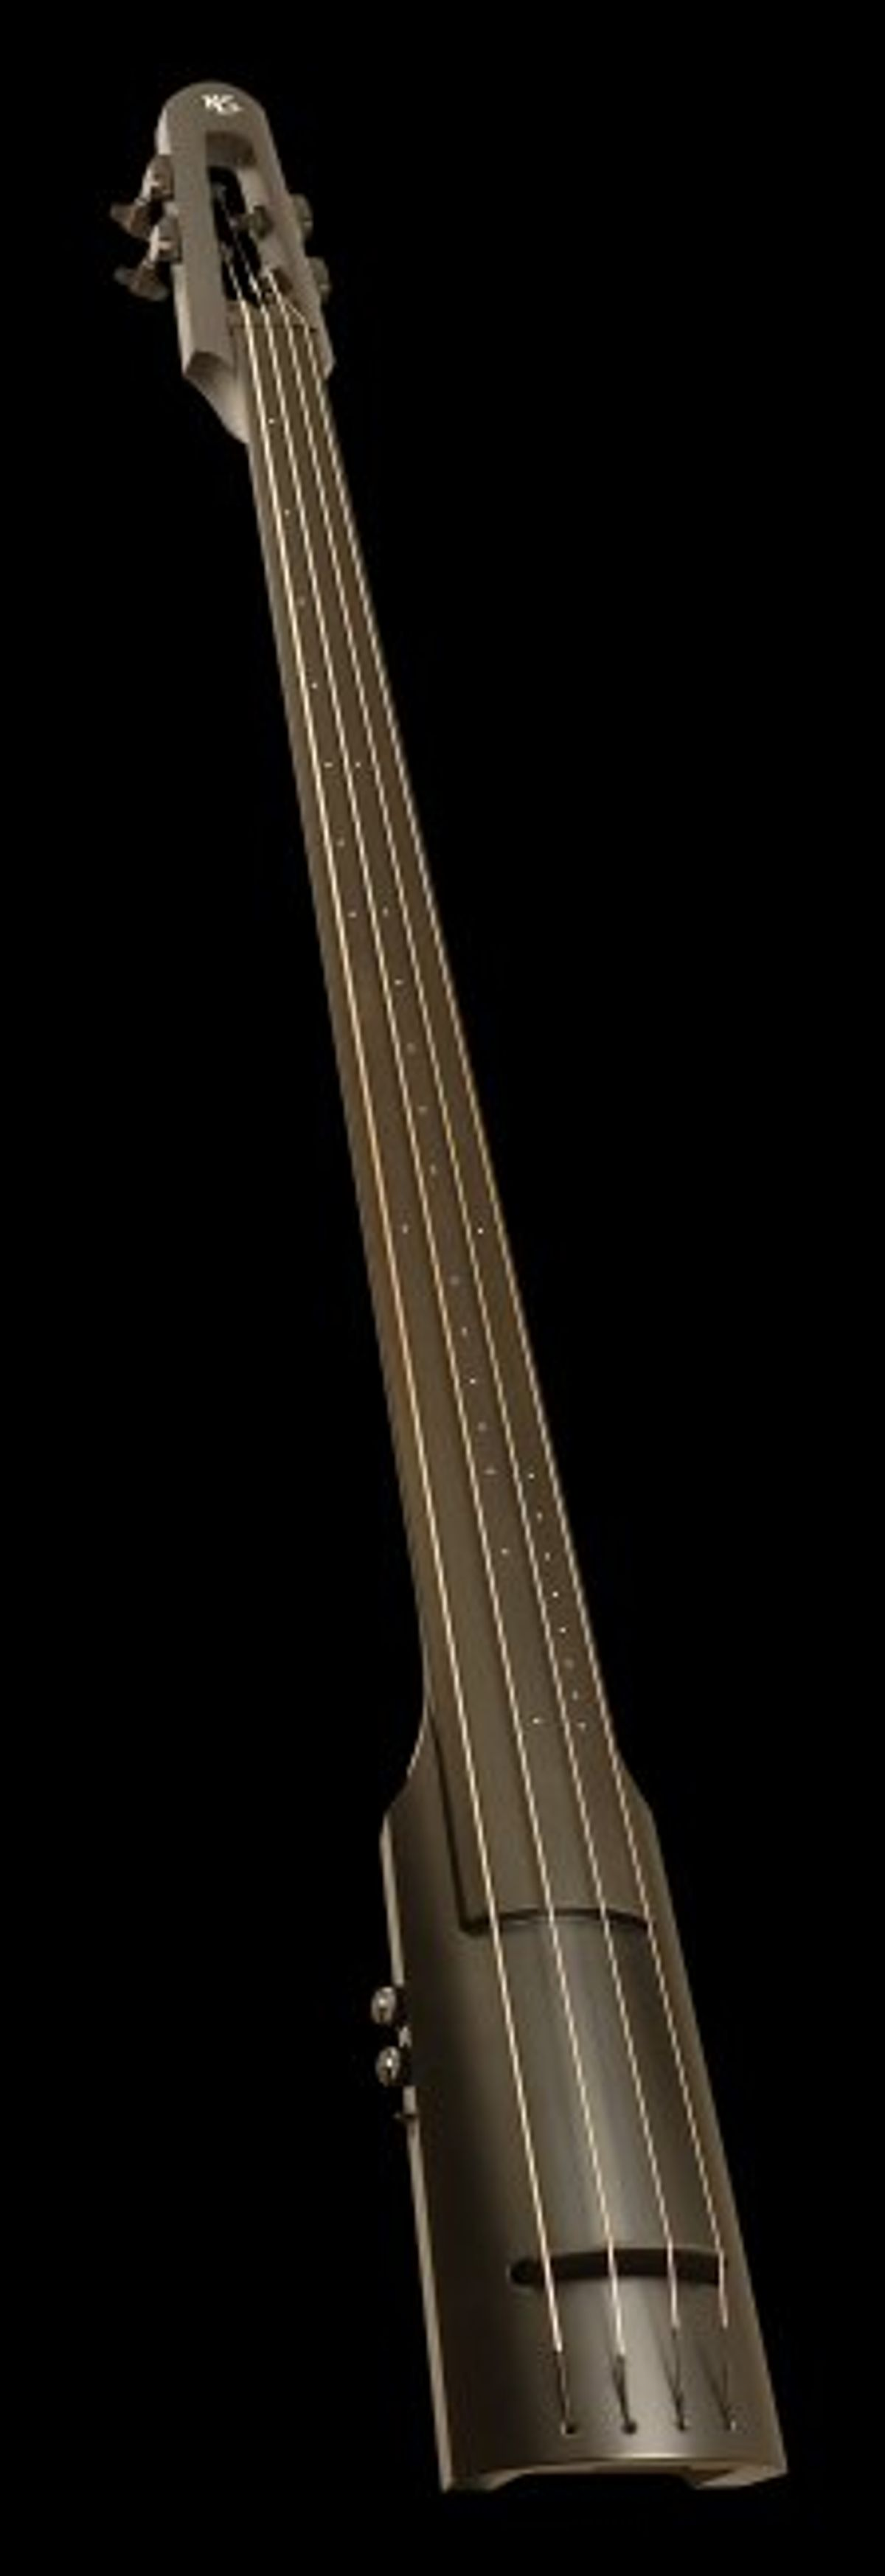 NS Designs Announces NXT Double Bass